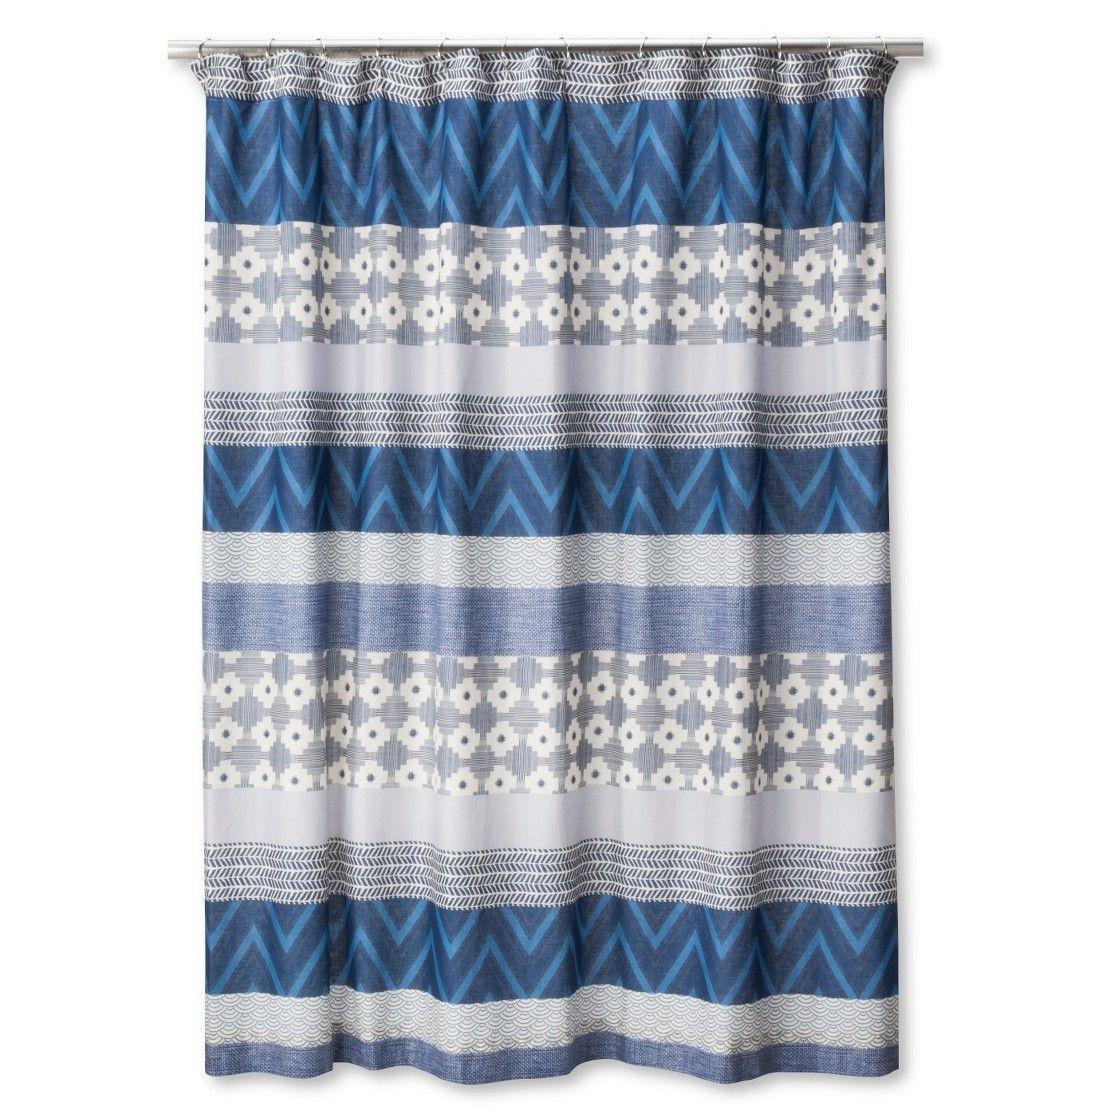 Mudhut Dhurrie Tie Dye Shower Curtain